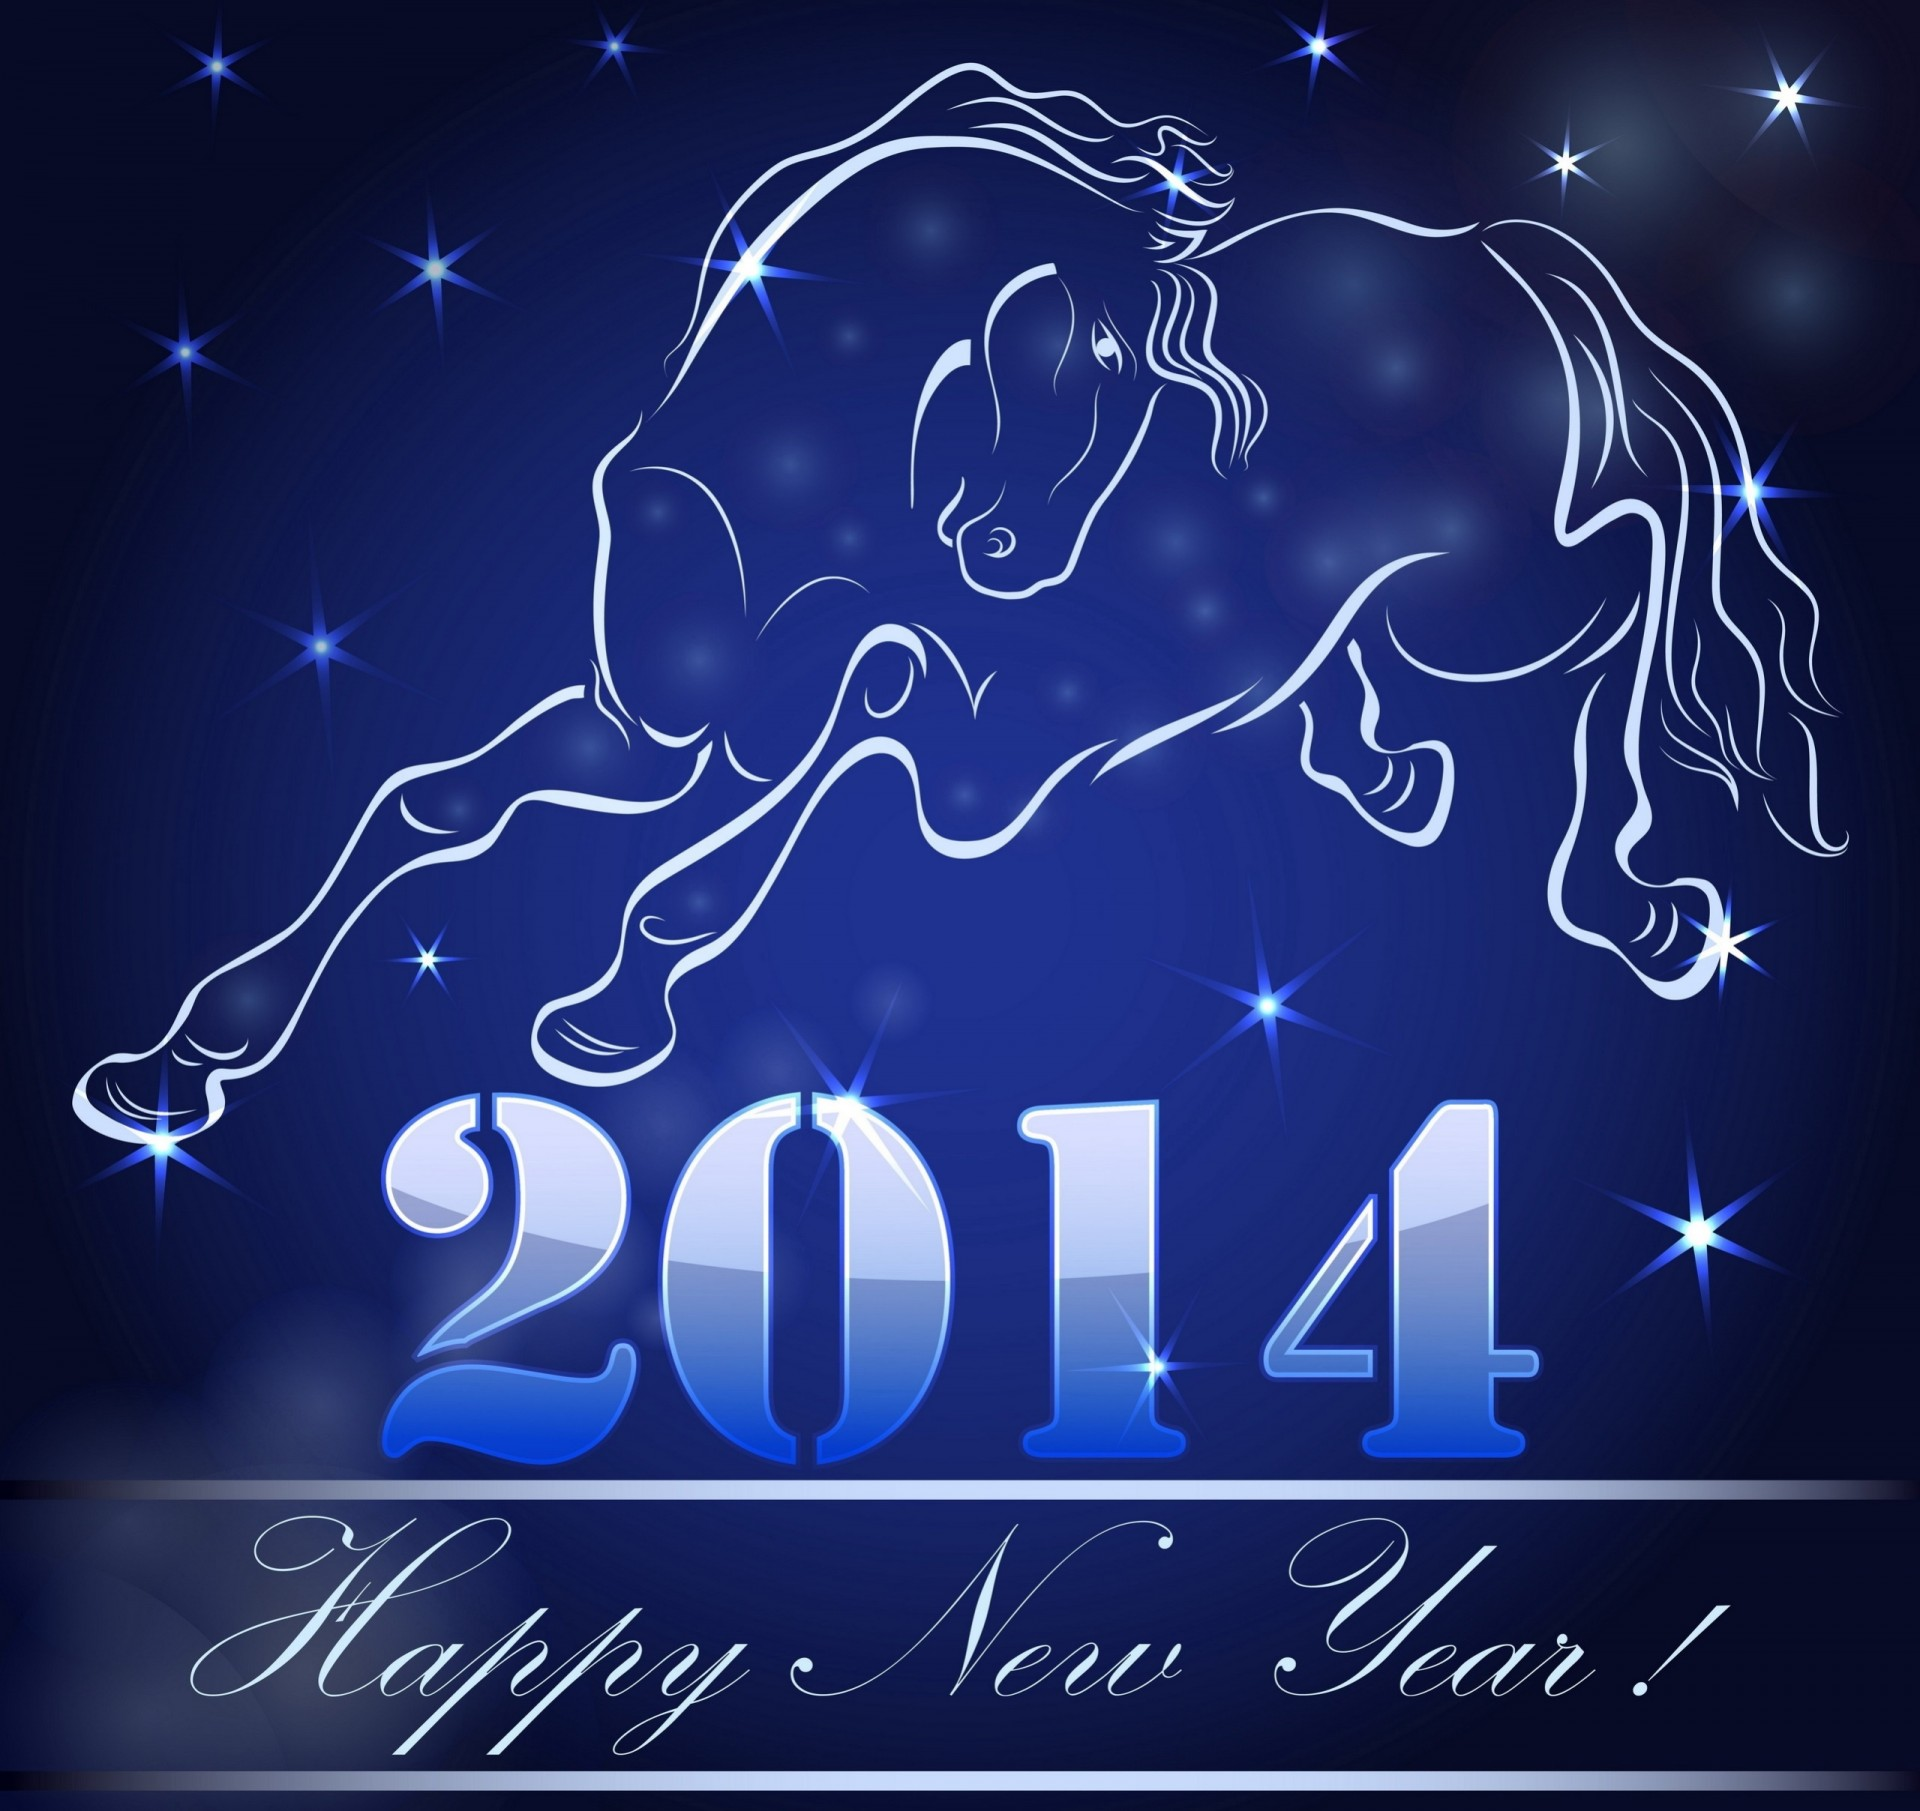 2014 год открытка